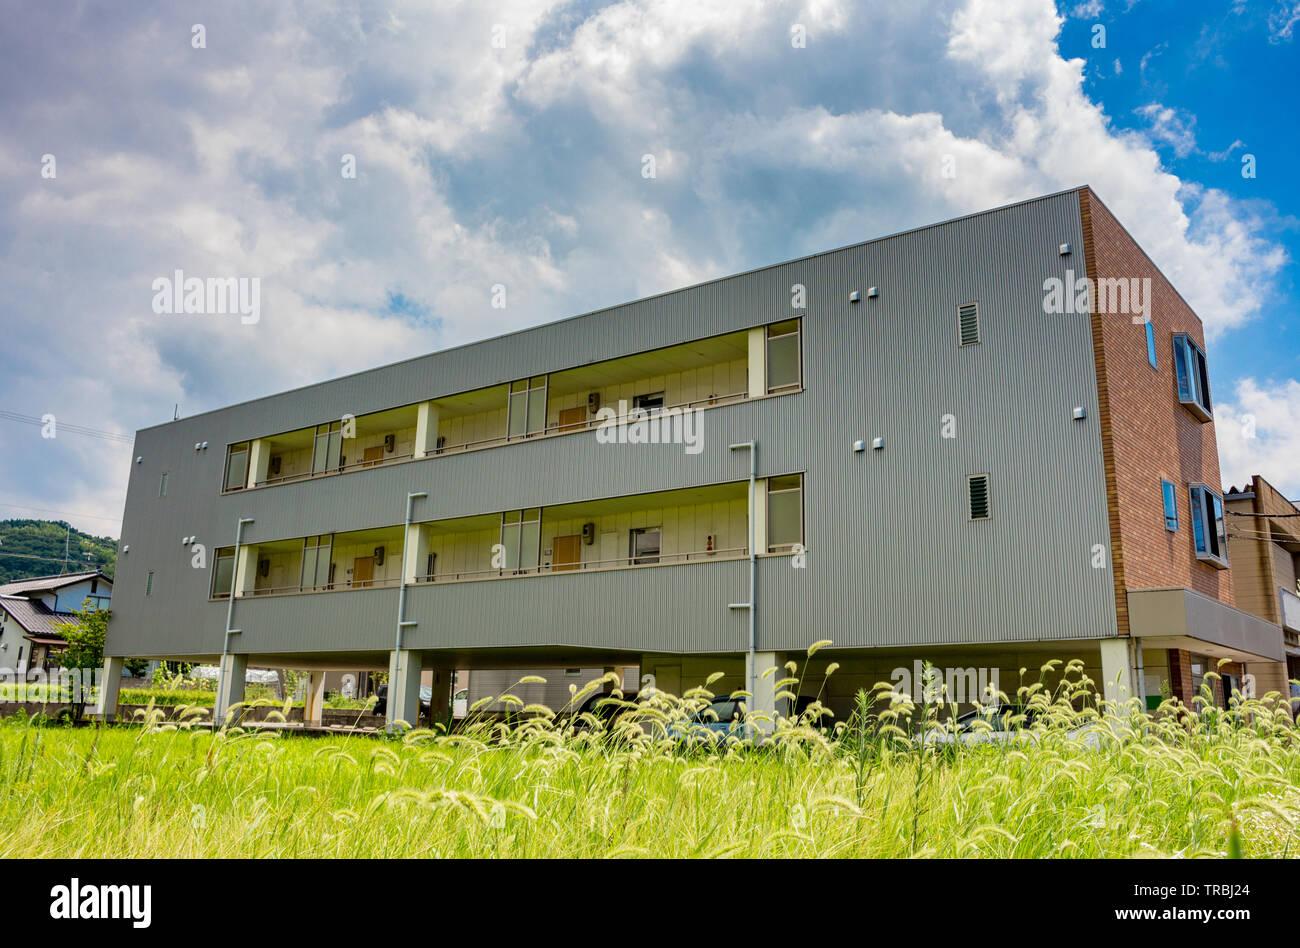 Apartment building, Kanazawa city, Ishikawa Prefecture, Japan. - Stock Image